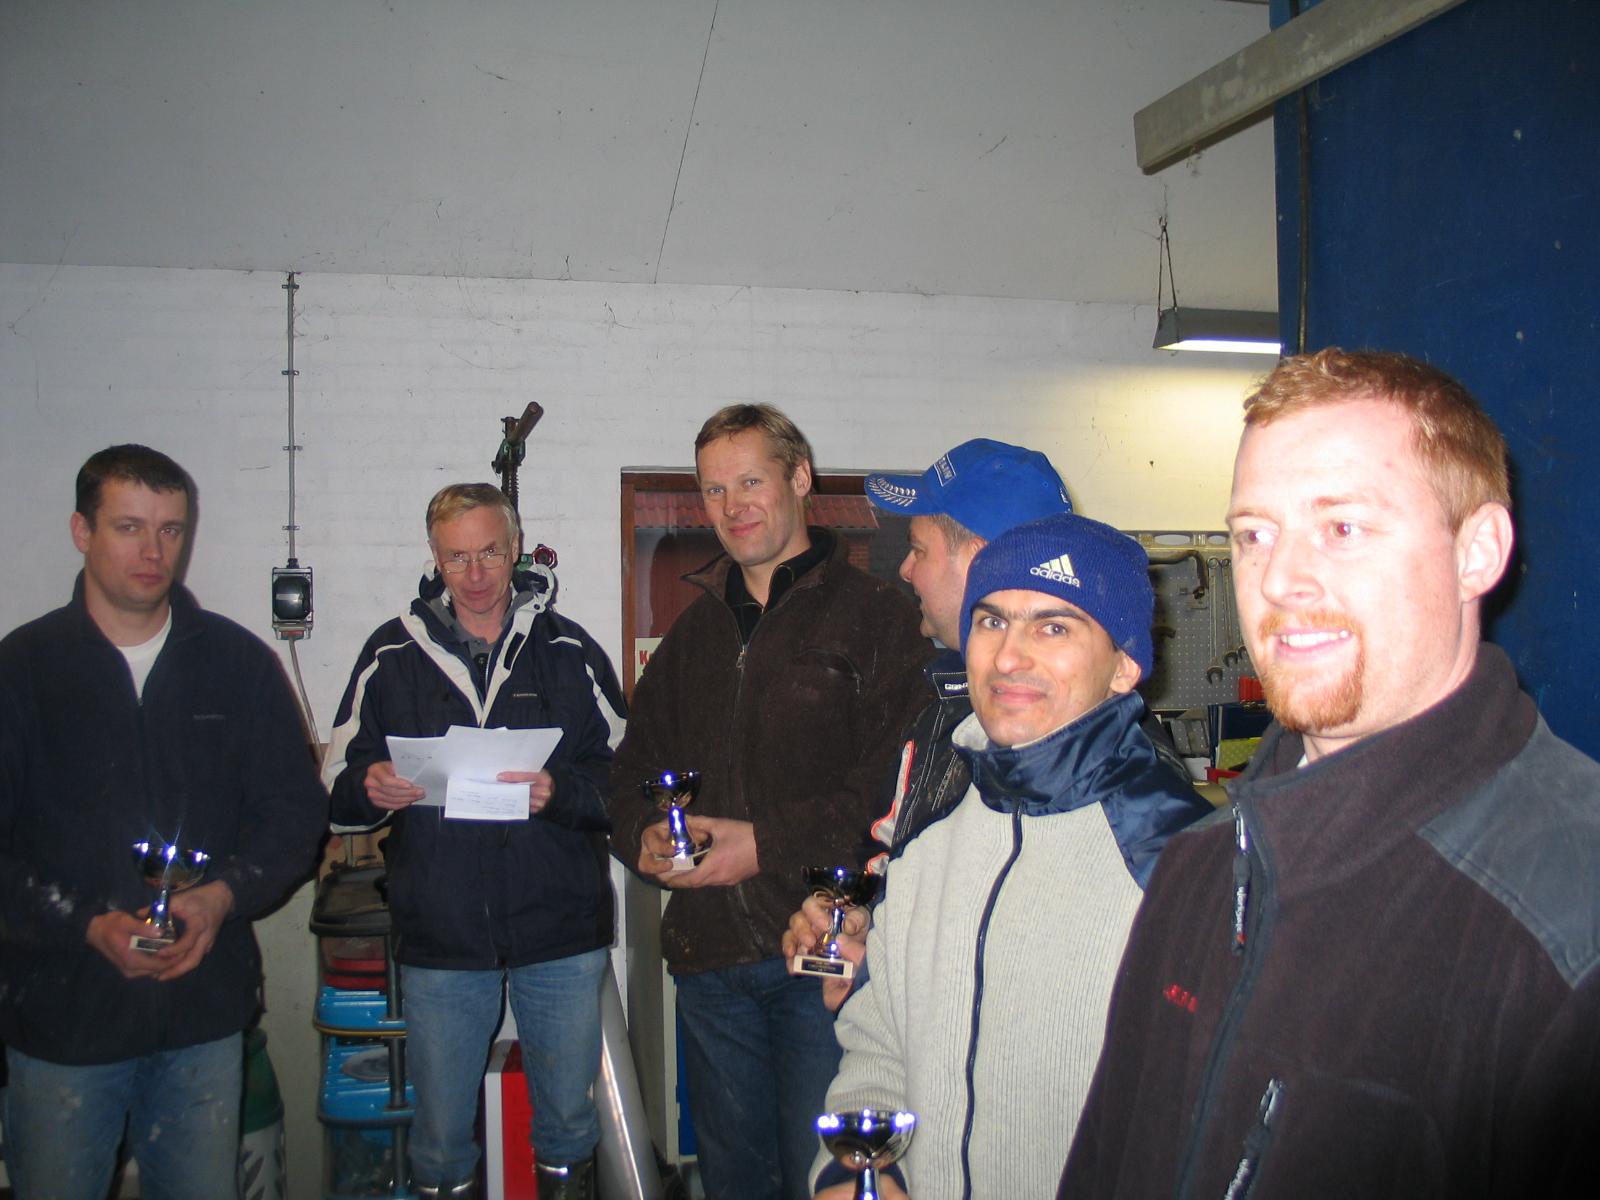 Klassementet. Vinder Kenneth Mikkelsen, nr. 2 Niels Ole Hald, nr. 3 Lars Sørensen, nr. 4 Reza Fomsgaard, nr. 5 Jesper Antonsen, FMS.